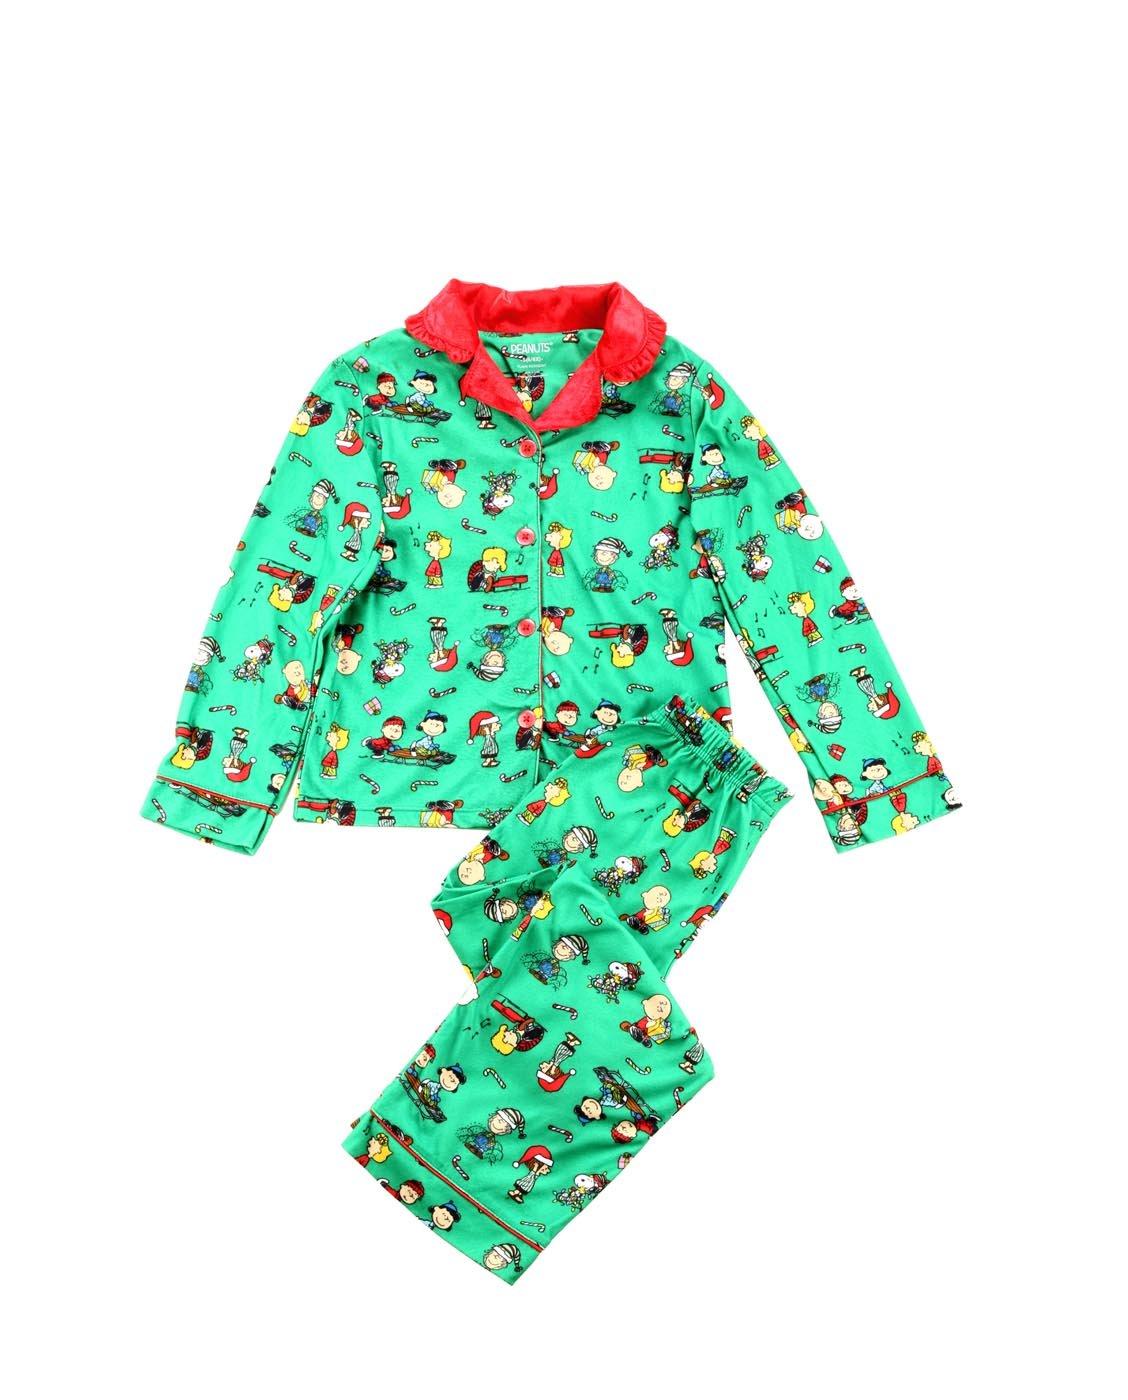 Peanuts Big Girls' 2pc Holiday Sleepwear Coat Set, Green, Small (6-6X)